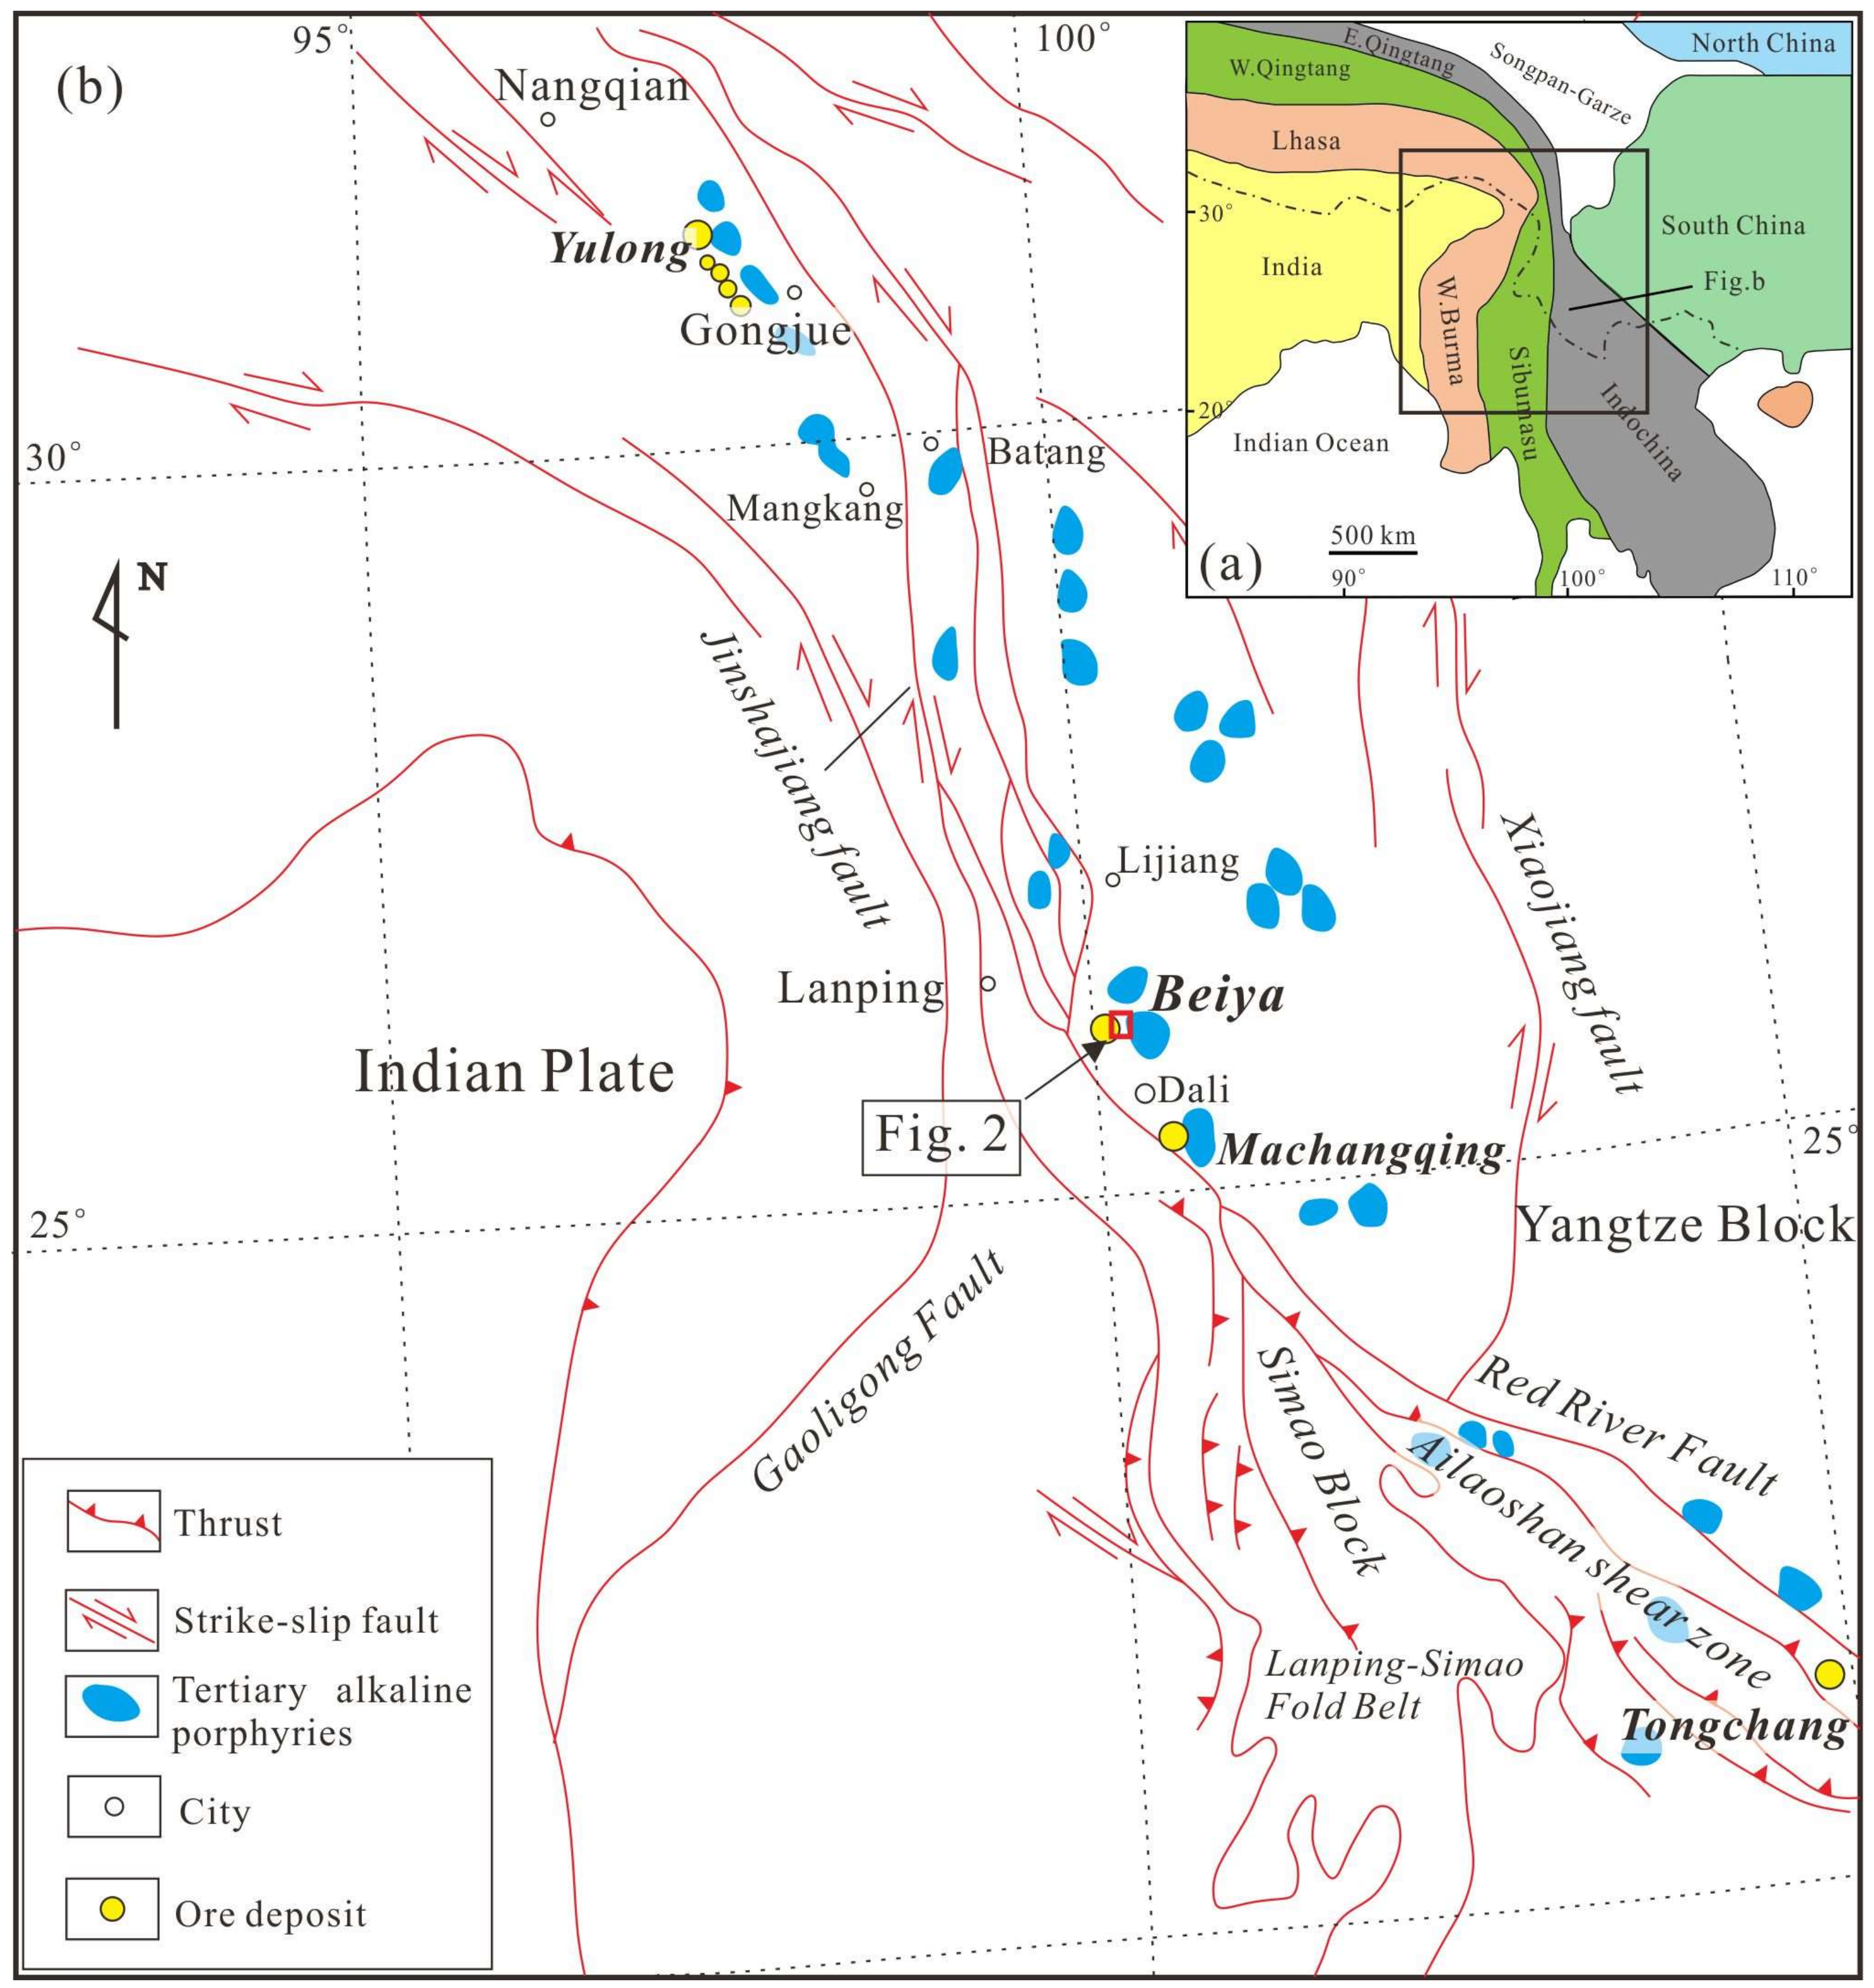 Tarbert Formation 70. in fluid inclusions 77-8 Tethys Margin interpretation burial history 147-9 diagenesis 146.